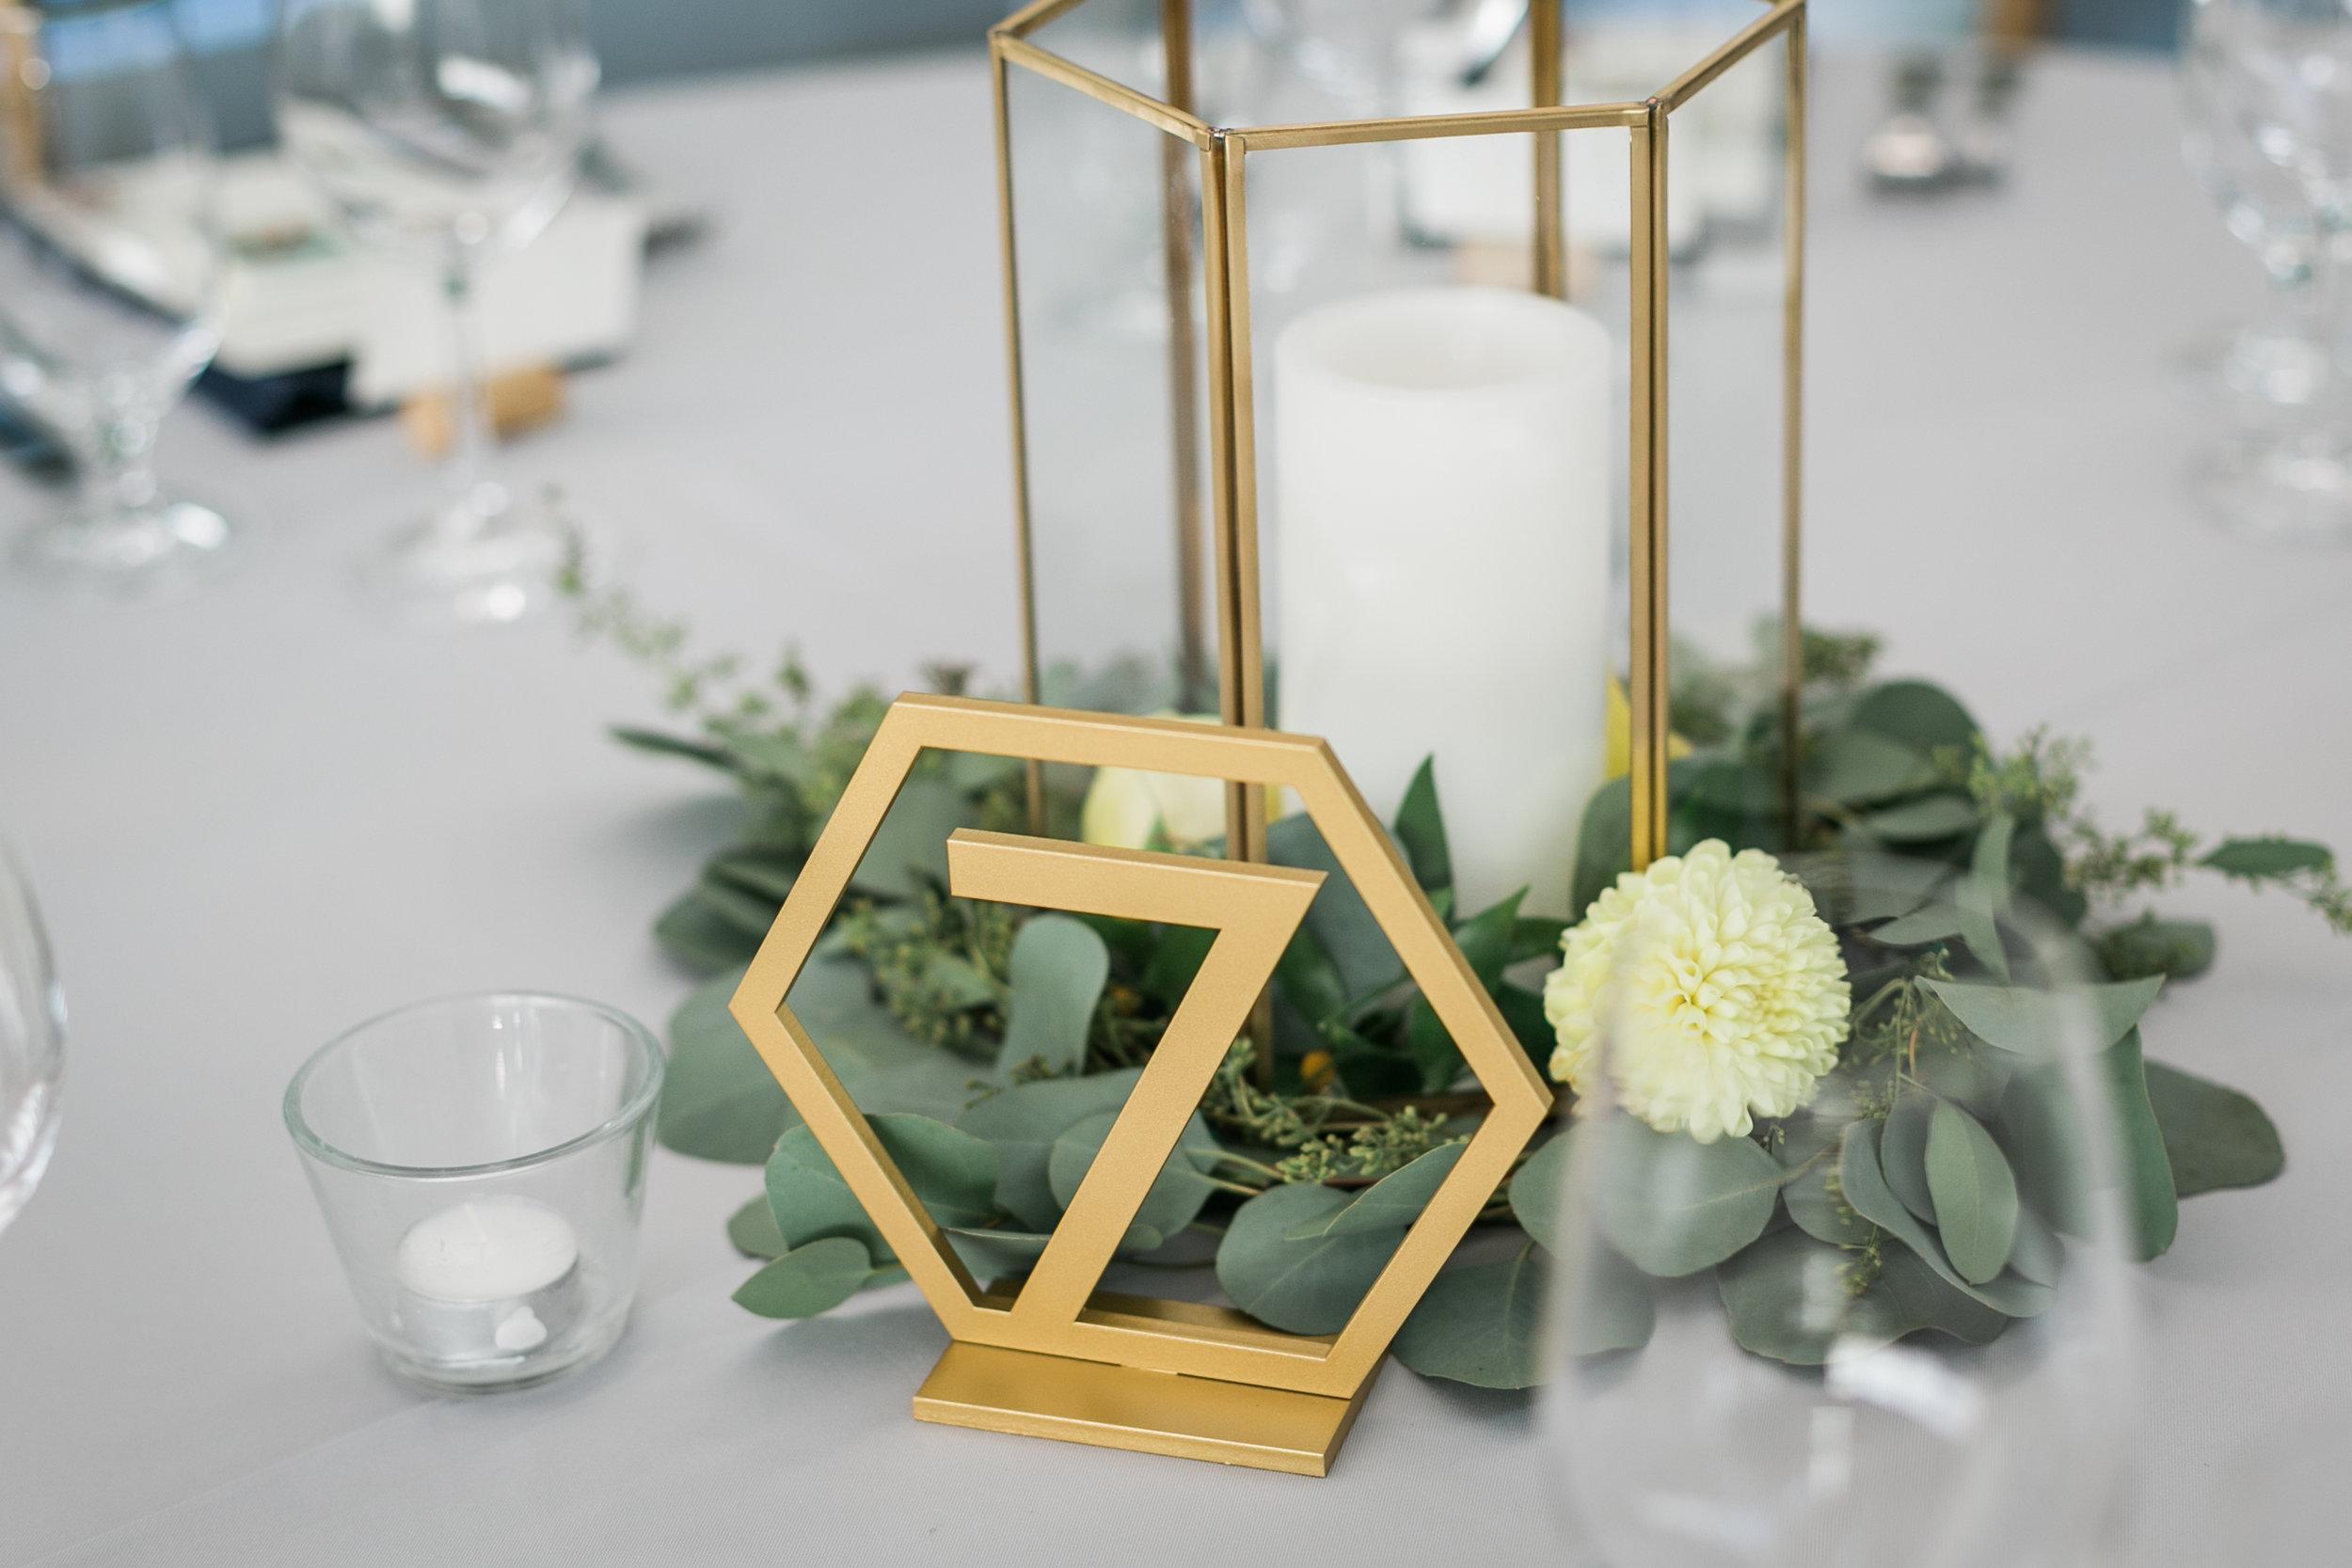 seattle-wedding-geometric-candles-greenery-modern-yellow-floral